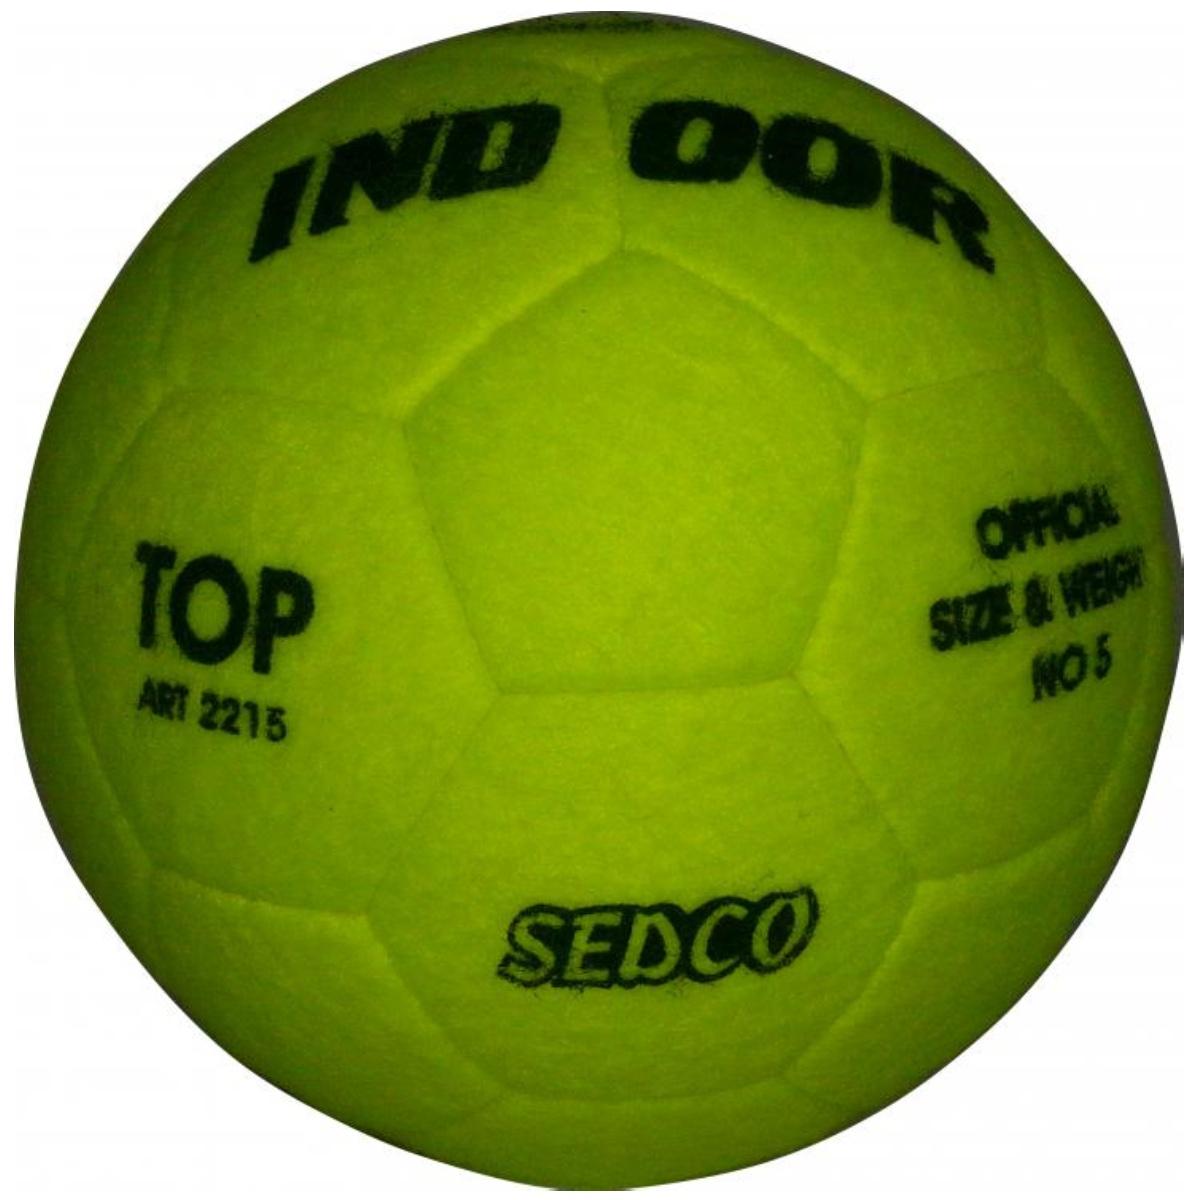 Fotbalový míč SEDCO Melton Filz